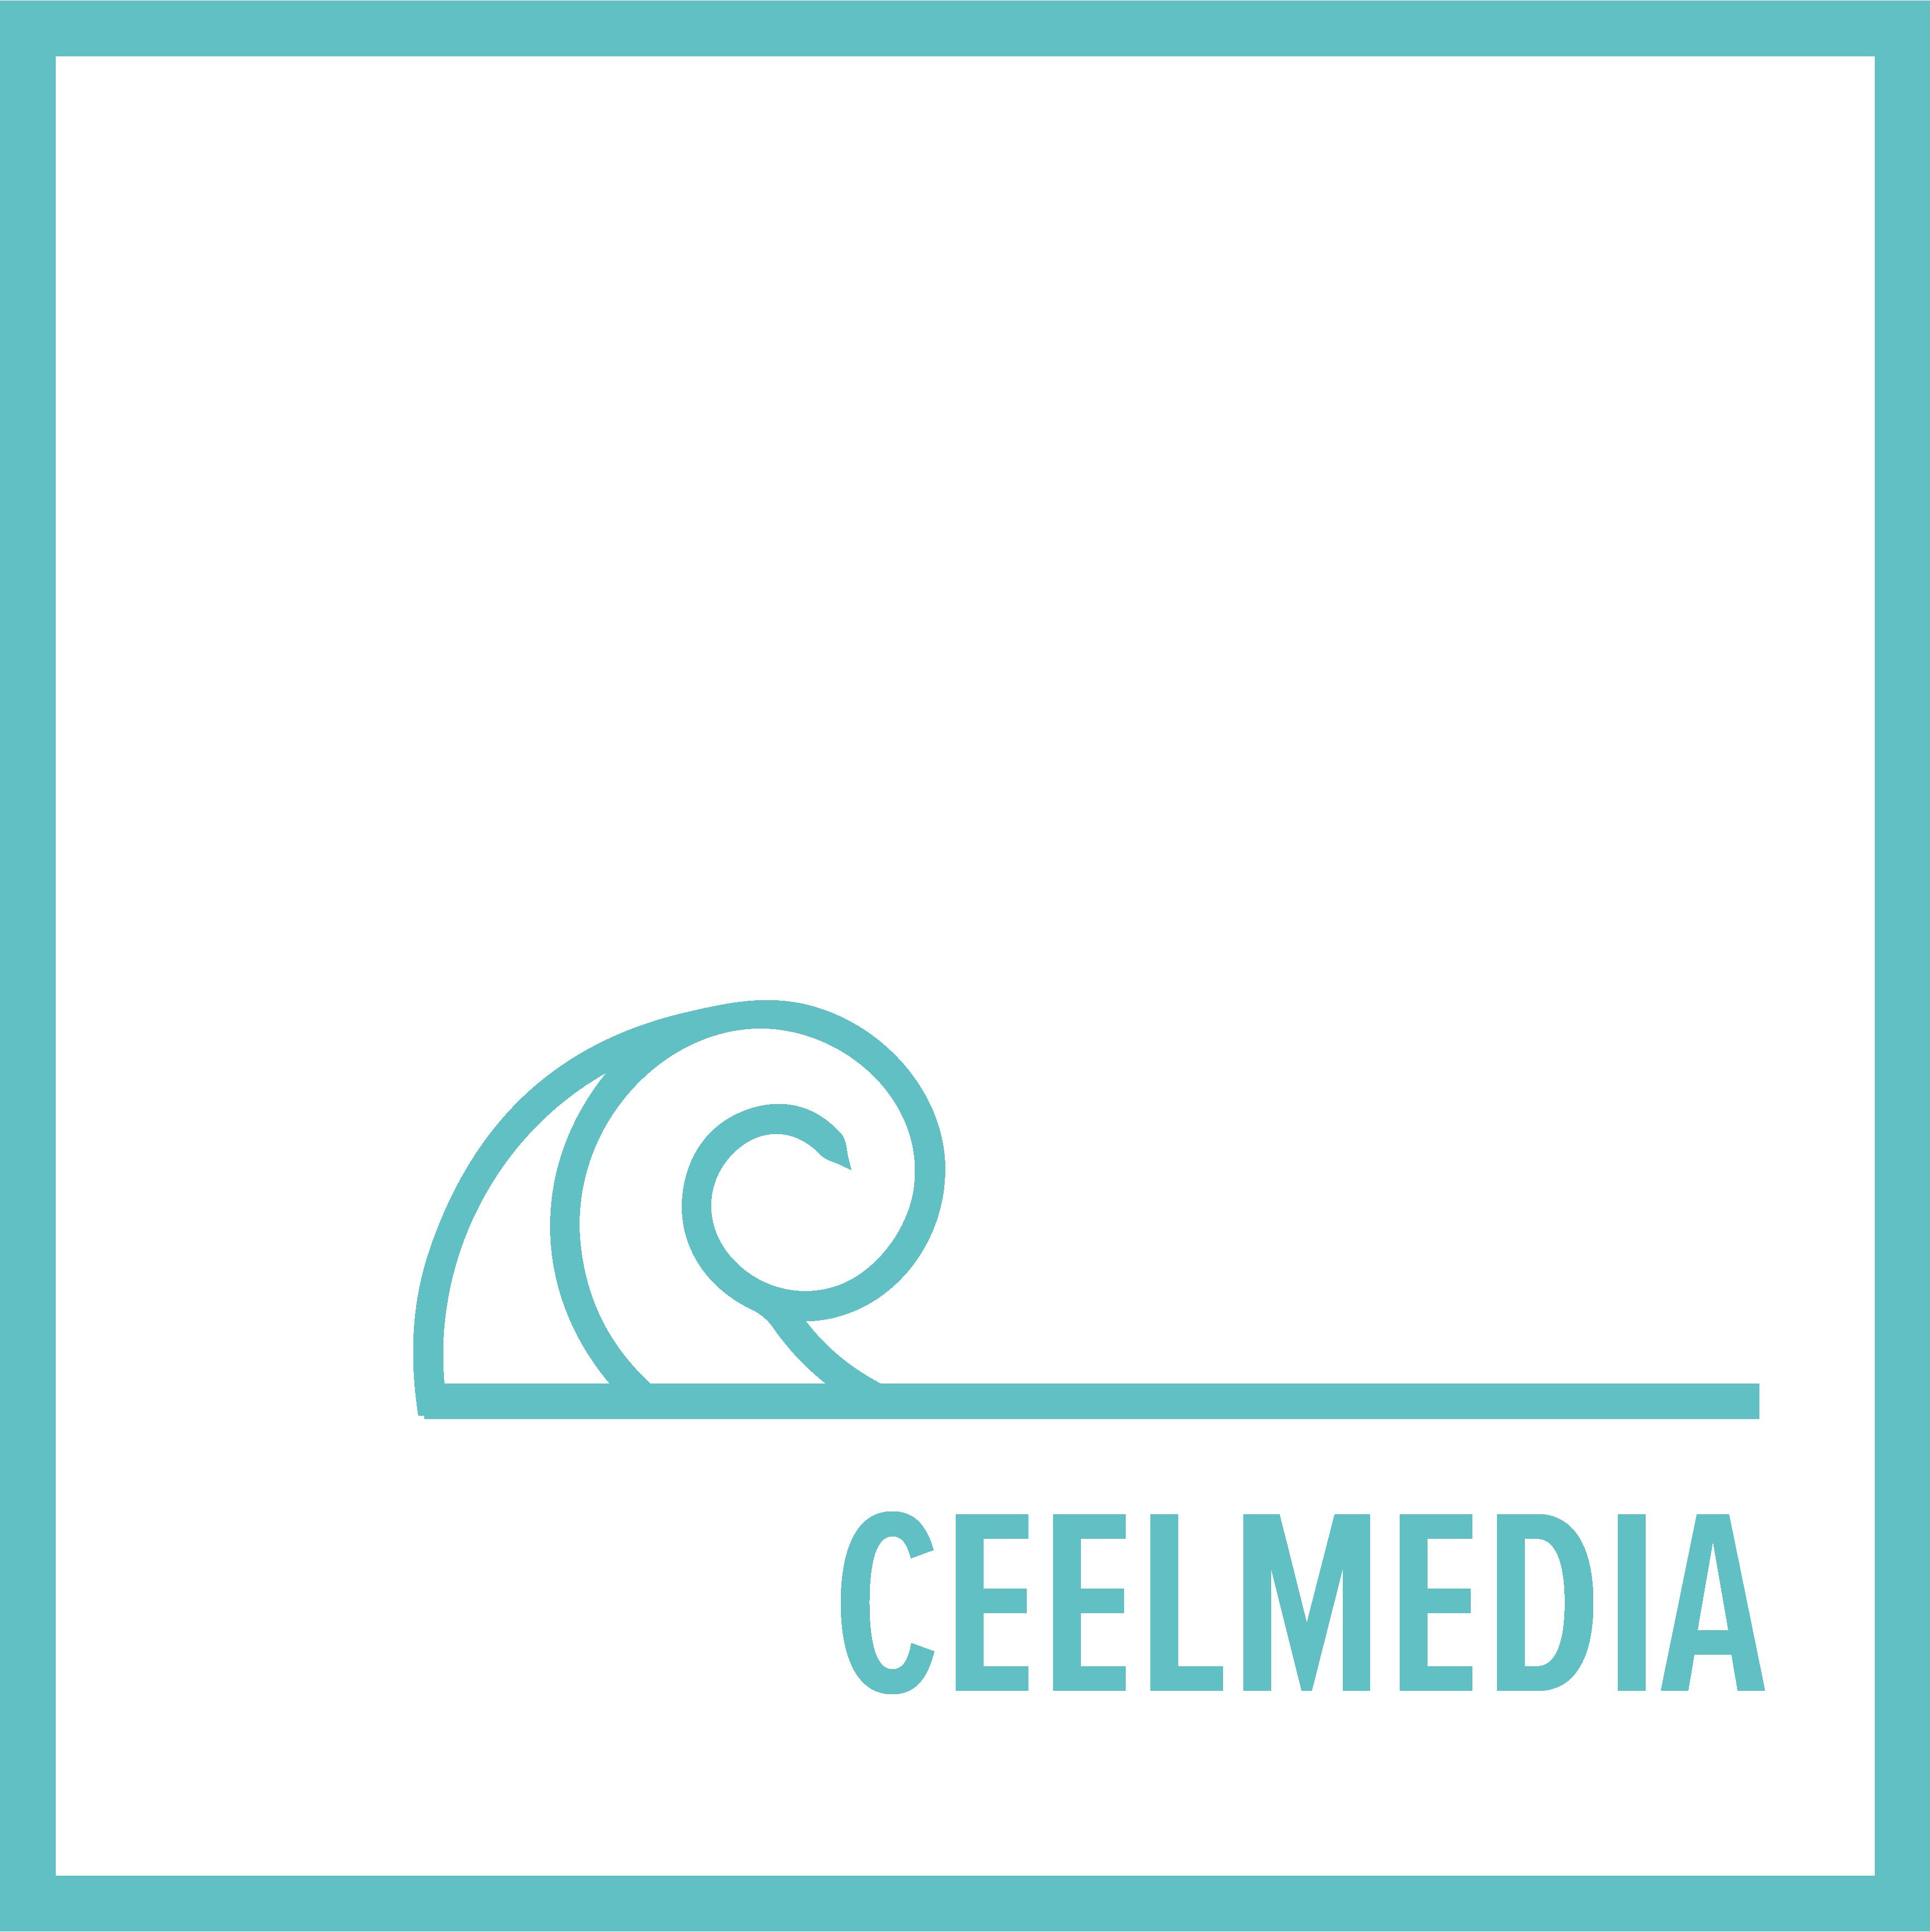 Ceelmedia